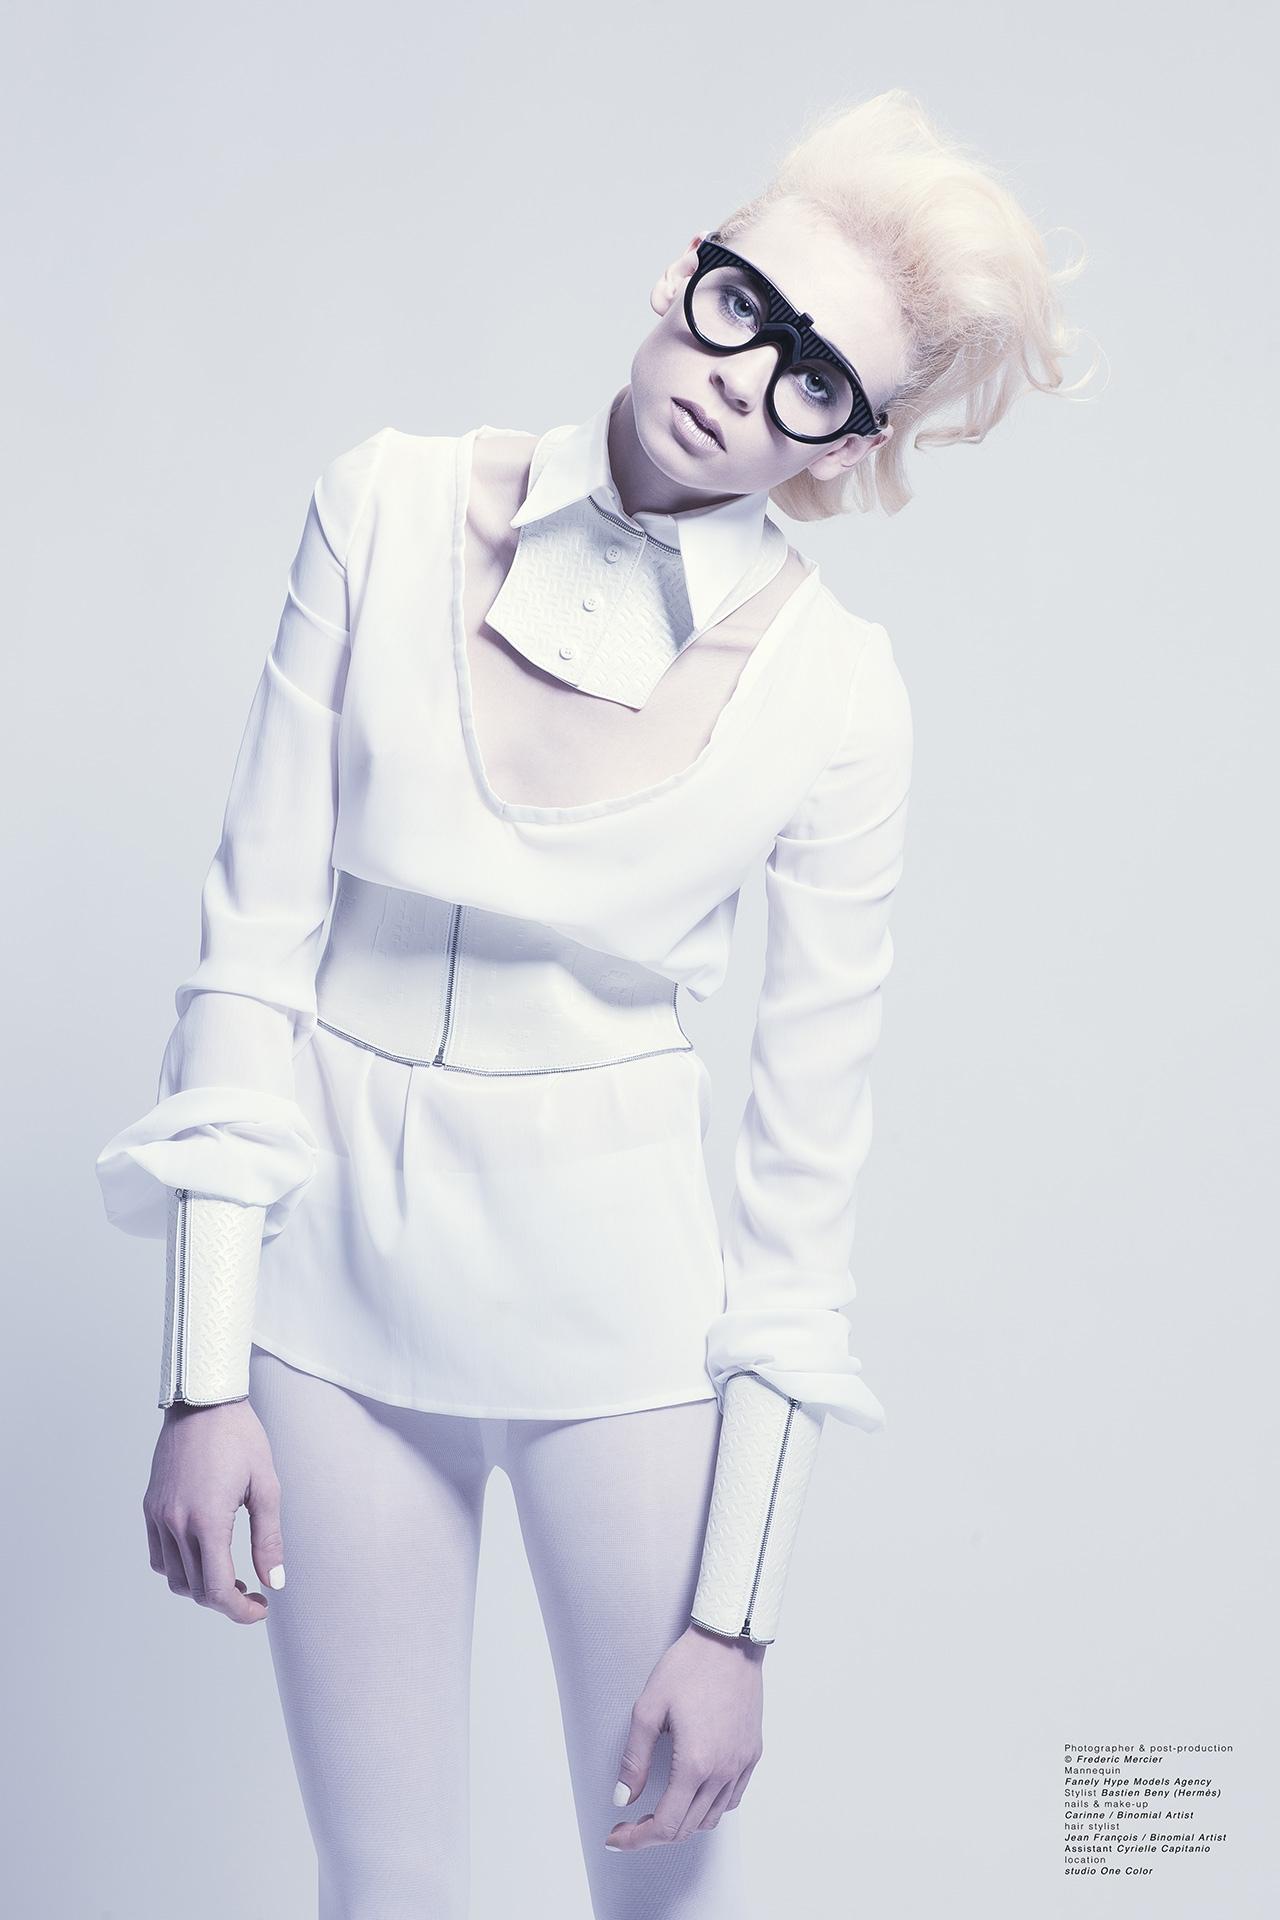 hermes frederic mercier photographer edito fashion bastien beny one color